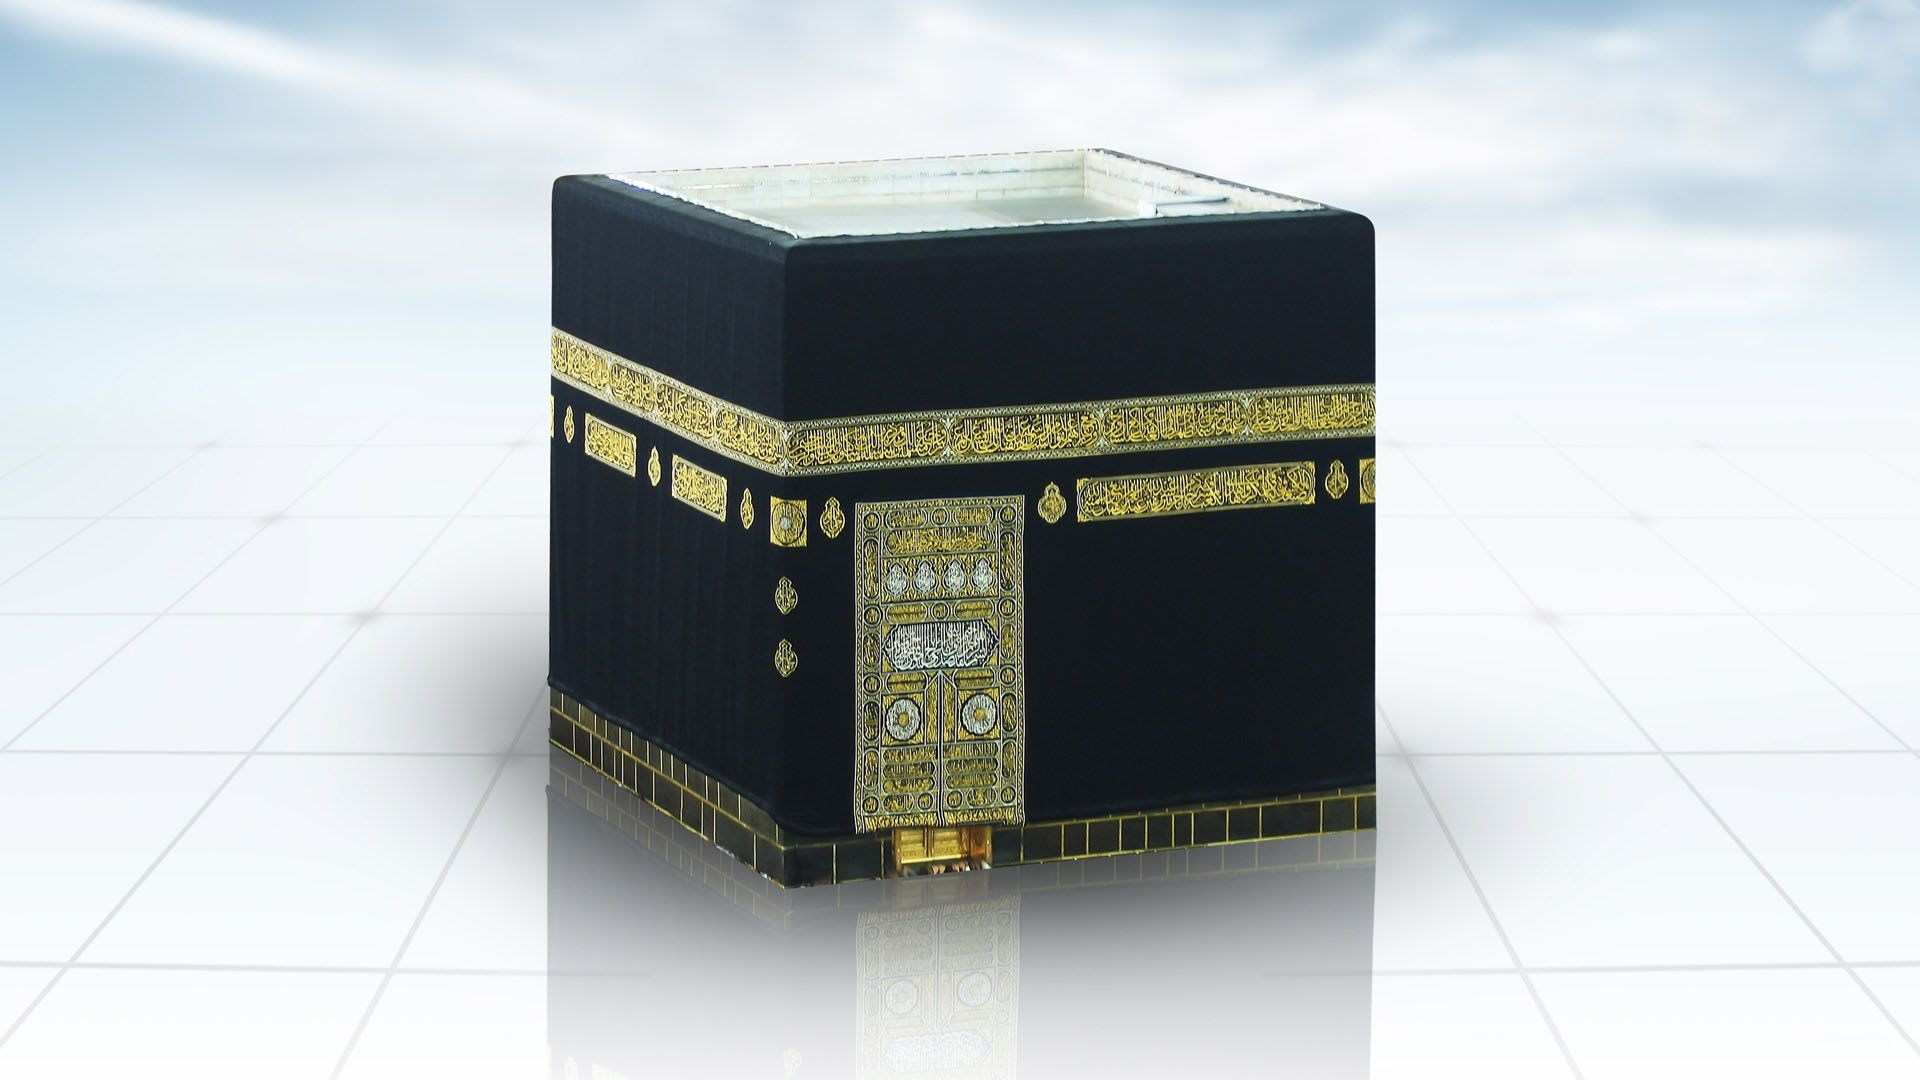 Mecca Desktop Background Free Download | Newhdpics | Mecca